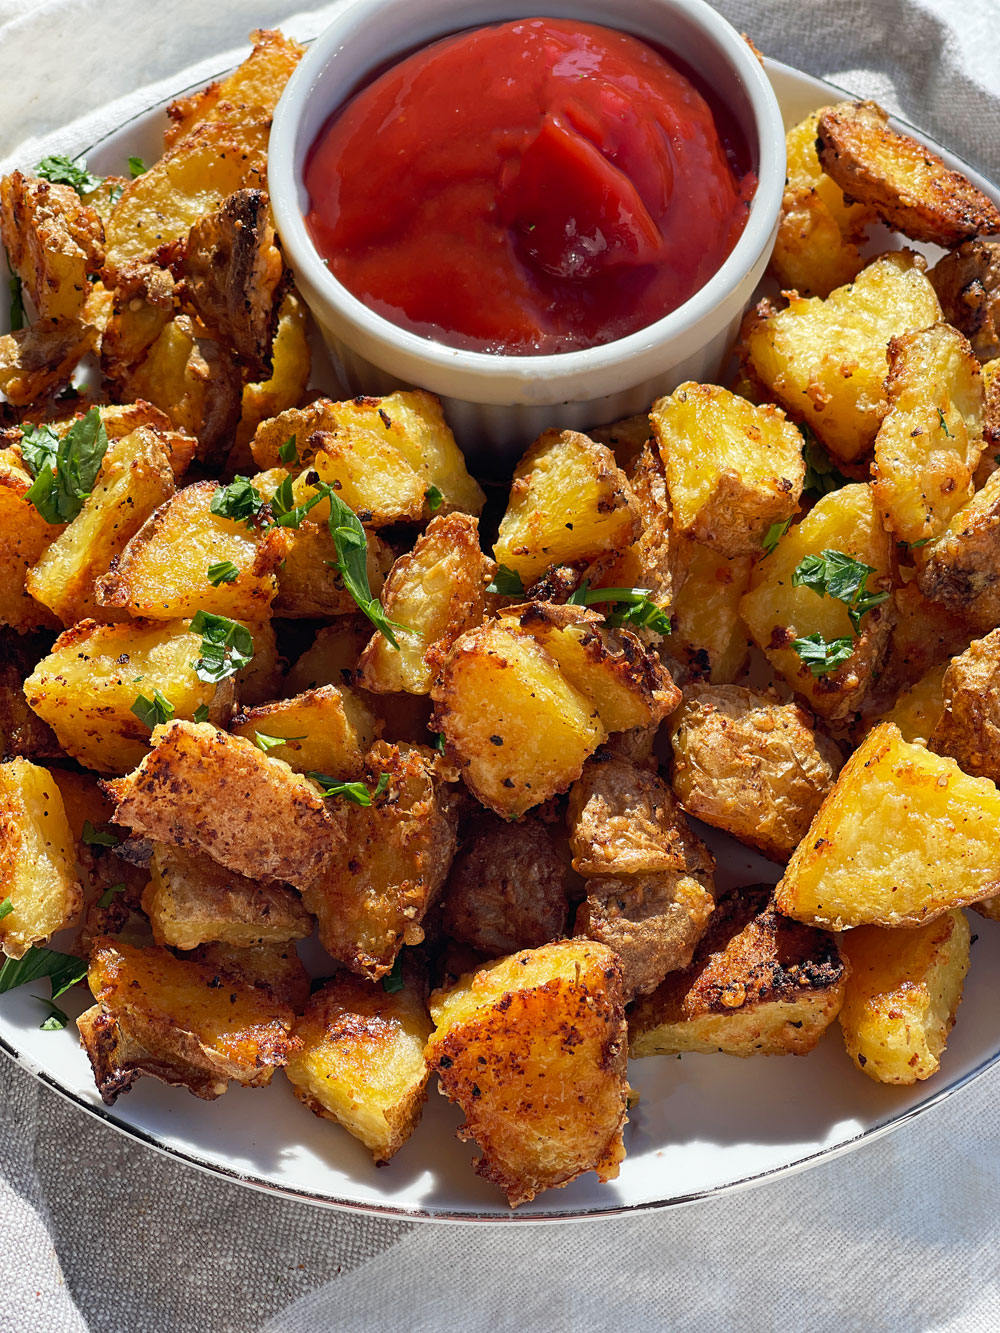 How to Make Crispy Potatoes in the Oven (TikTok Potato Hack)